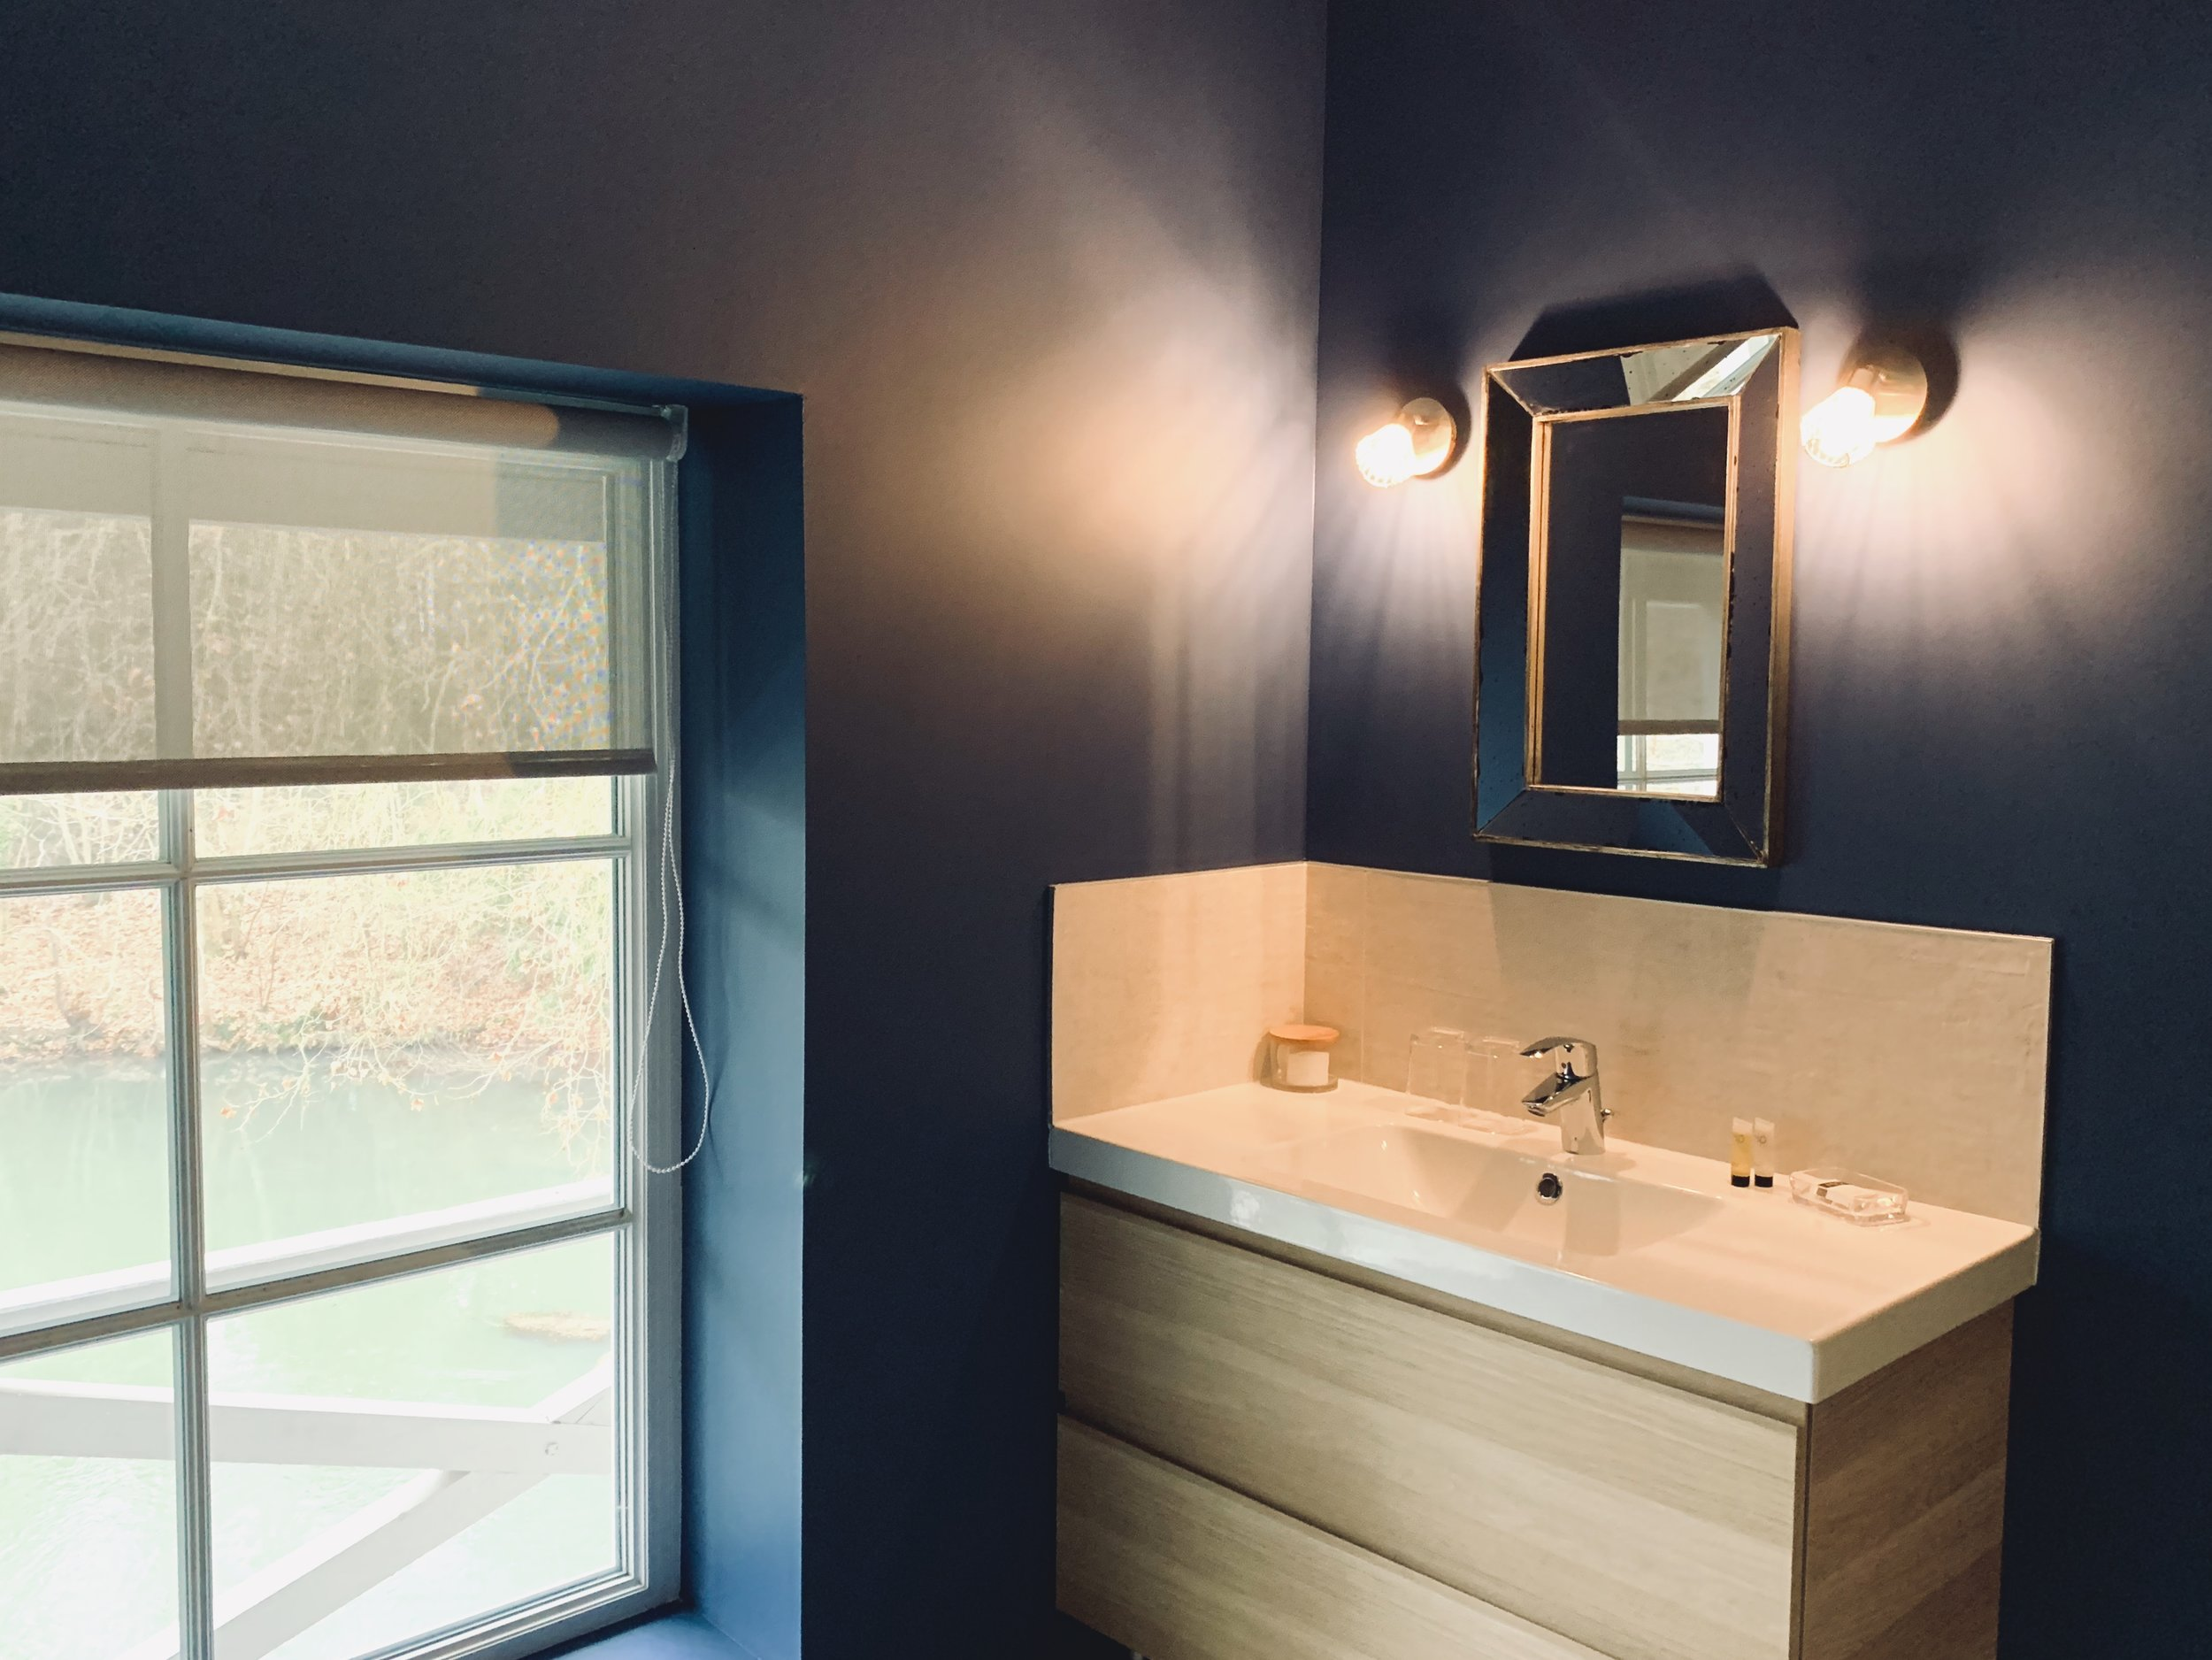 salle de bain meuble vasque mur petrole